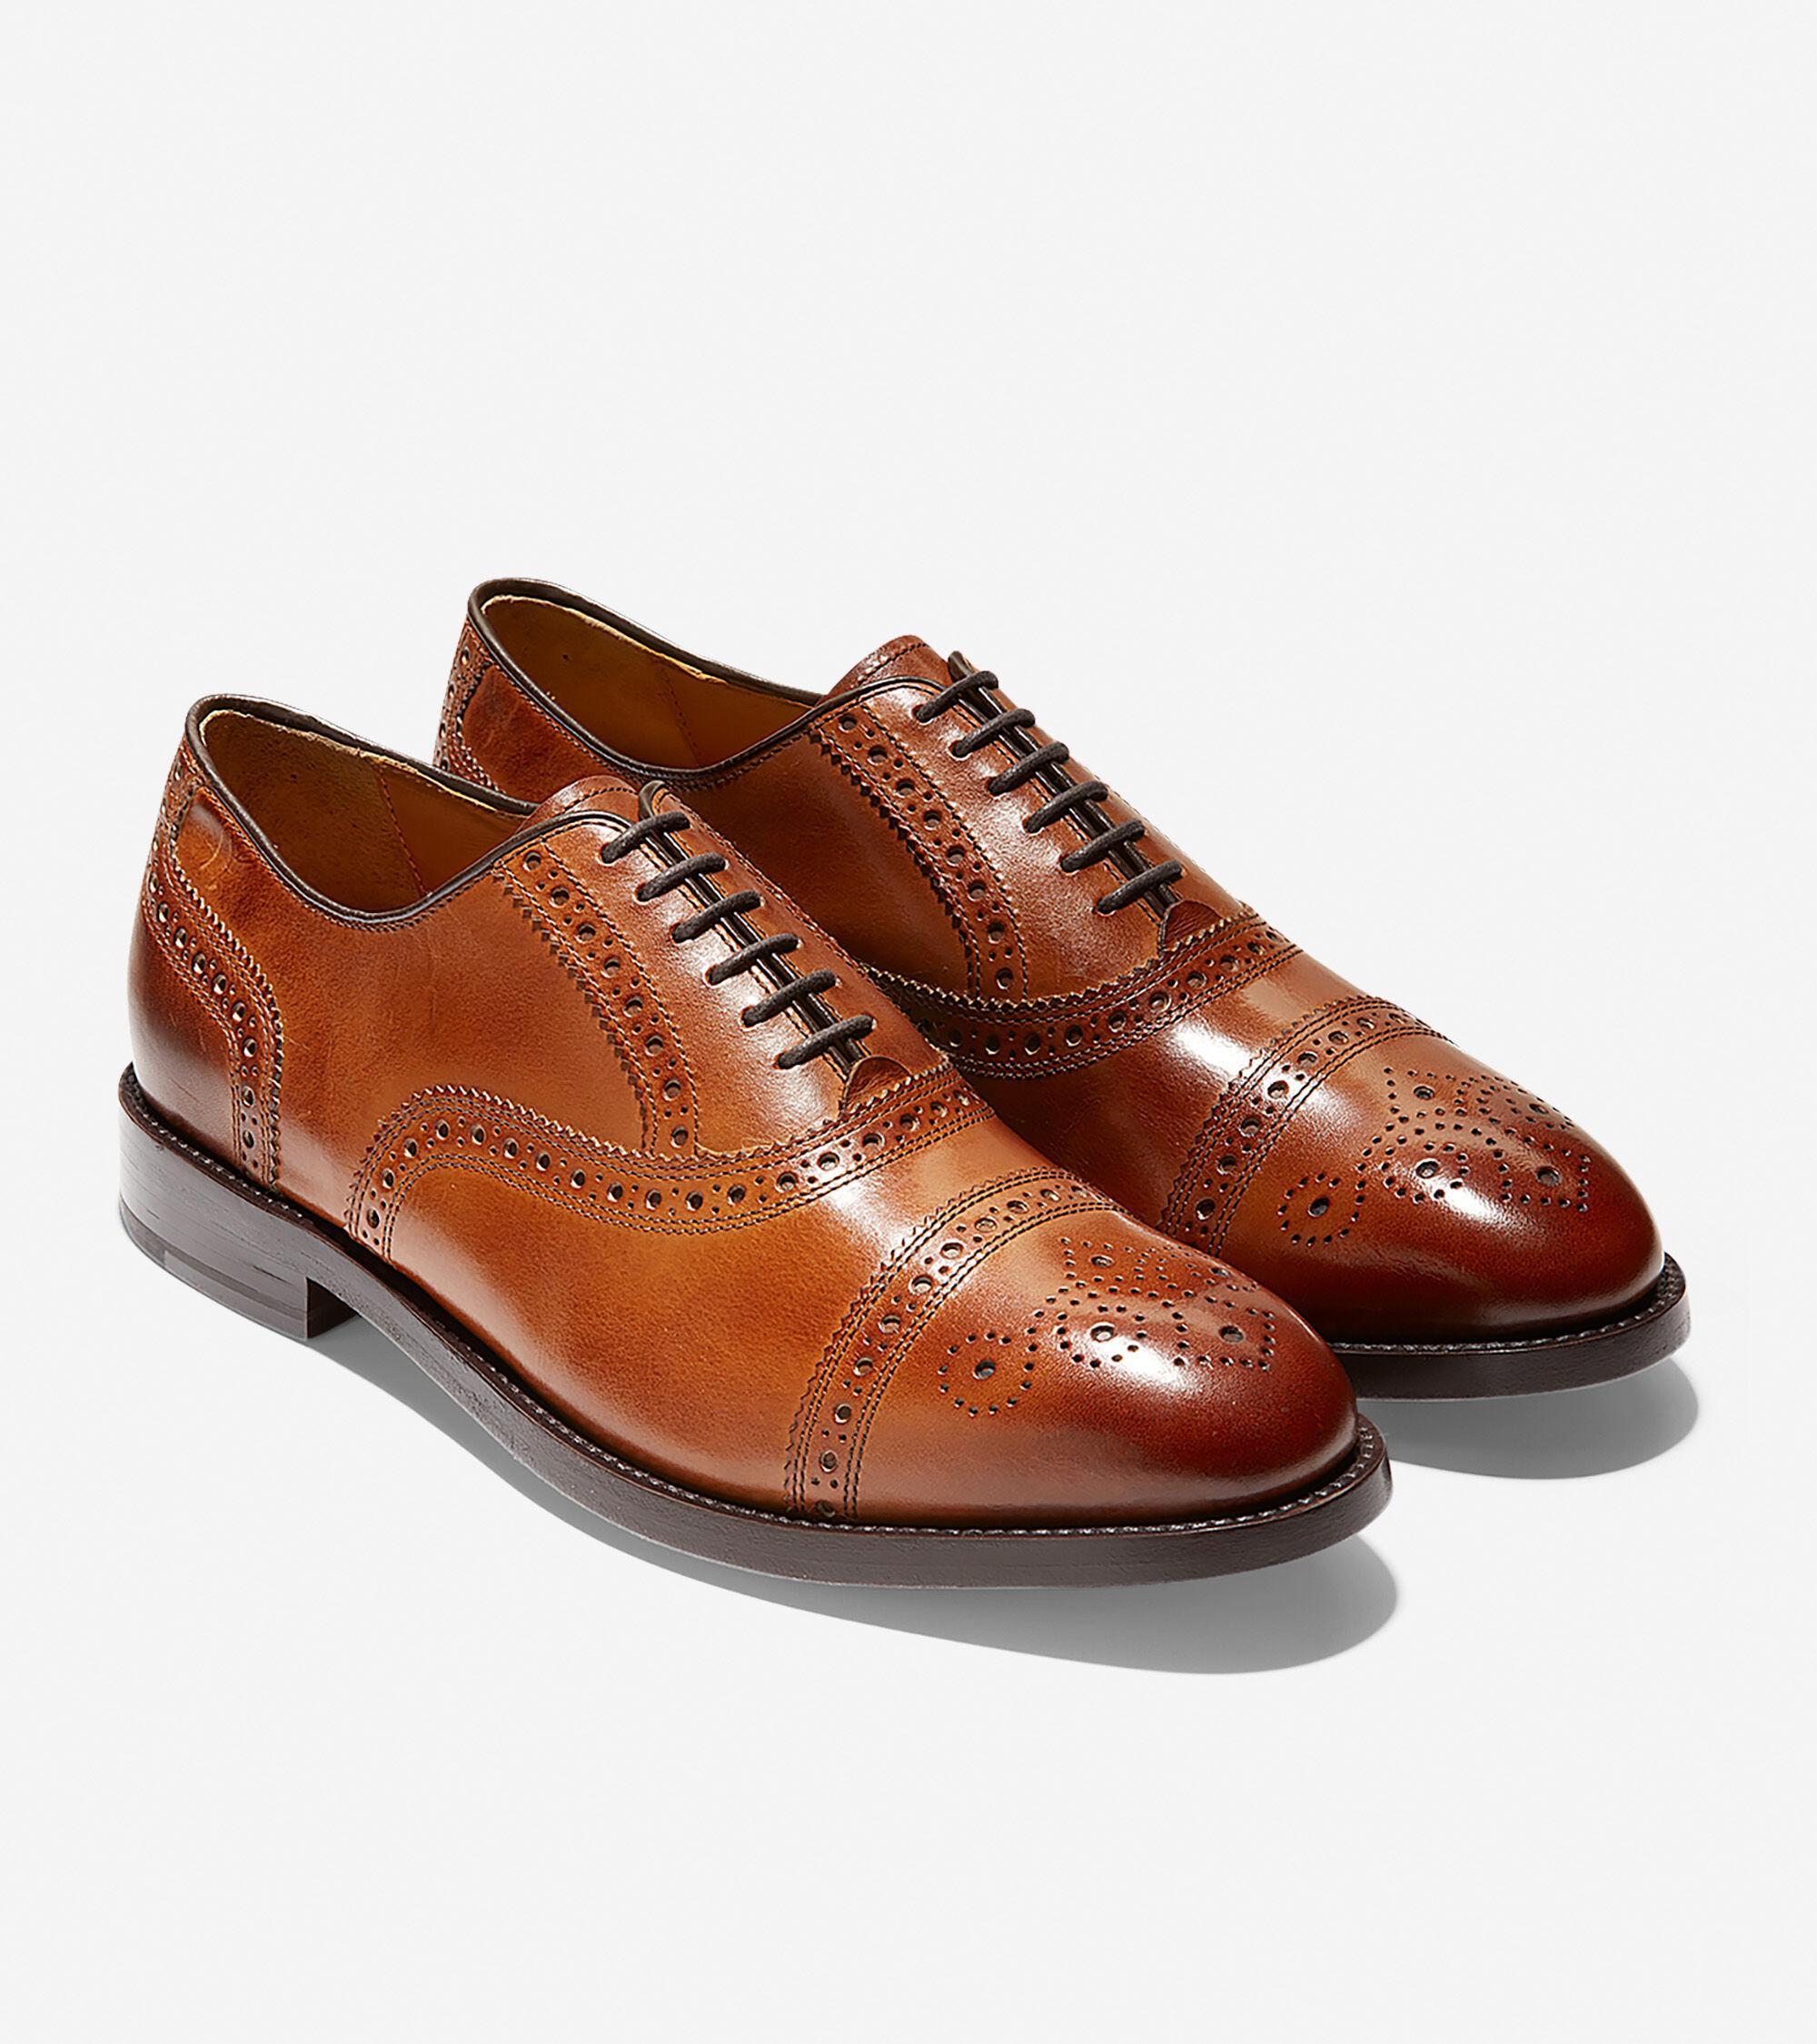 eae97ec54 ... Cole Haan American Classic Kneeland Brogue Cap Toe Oxford ...